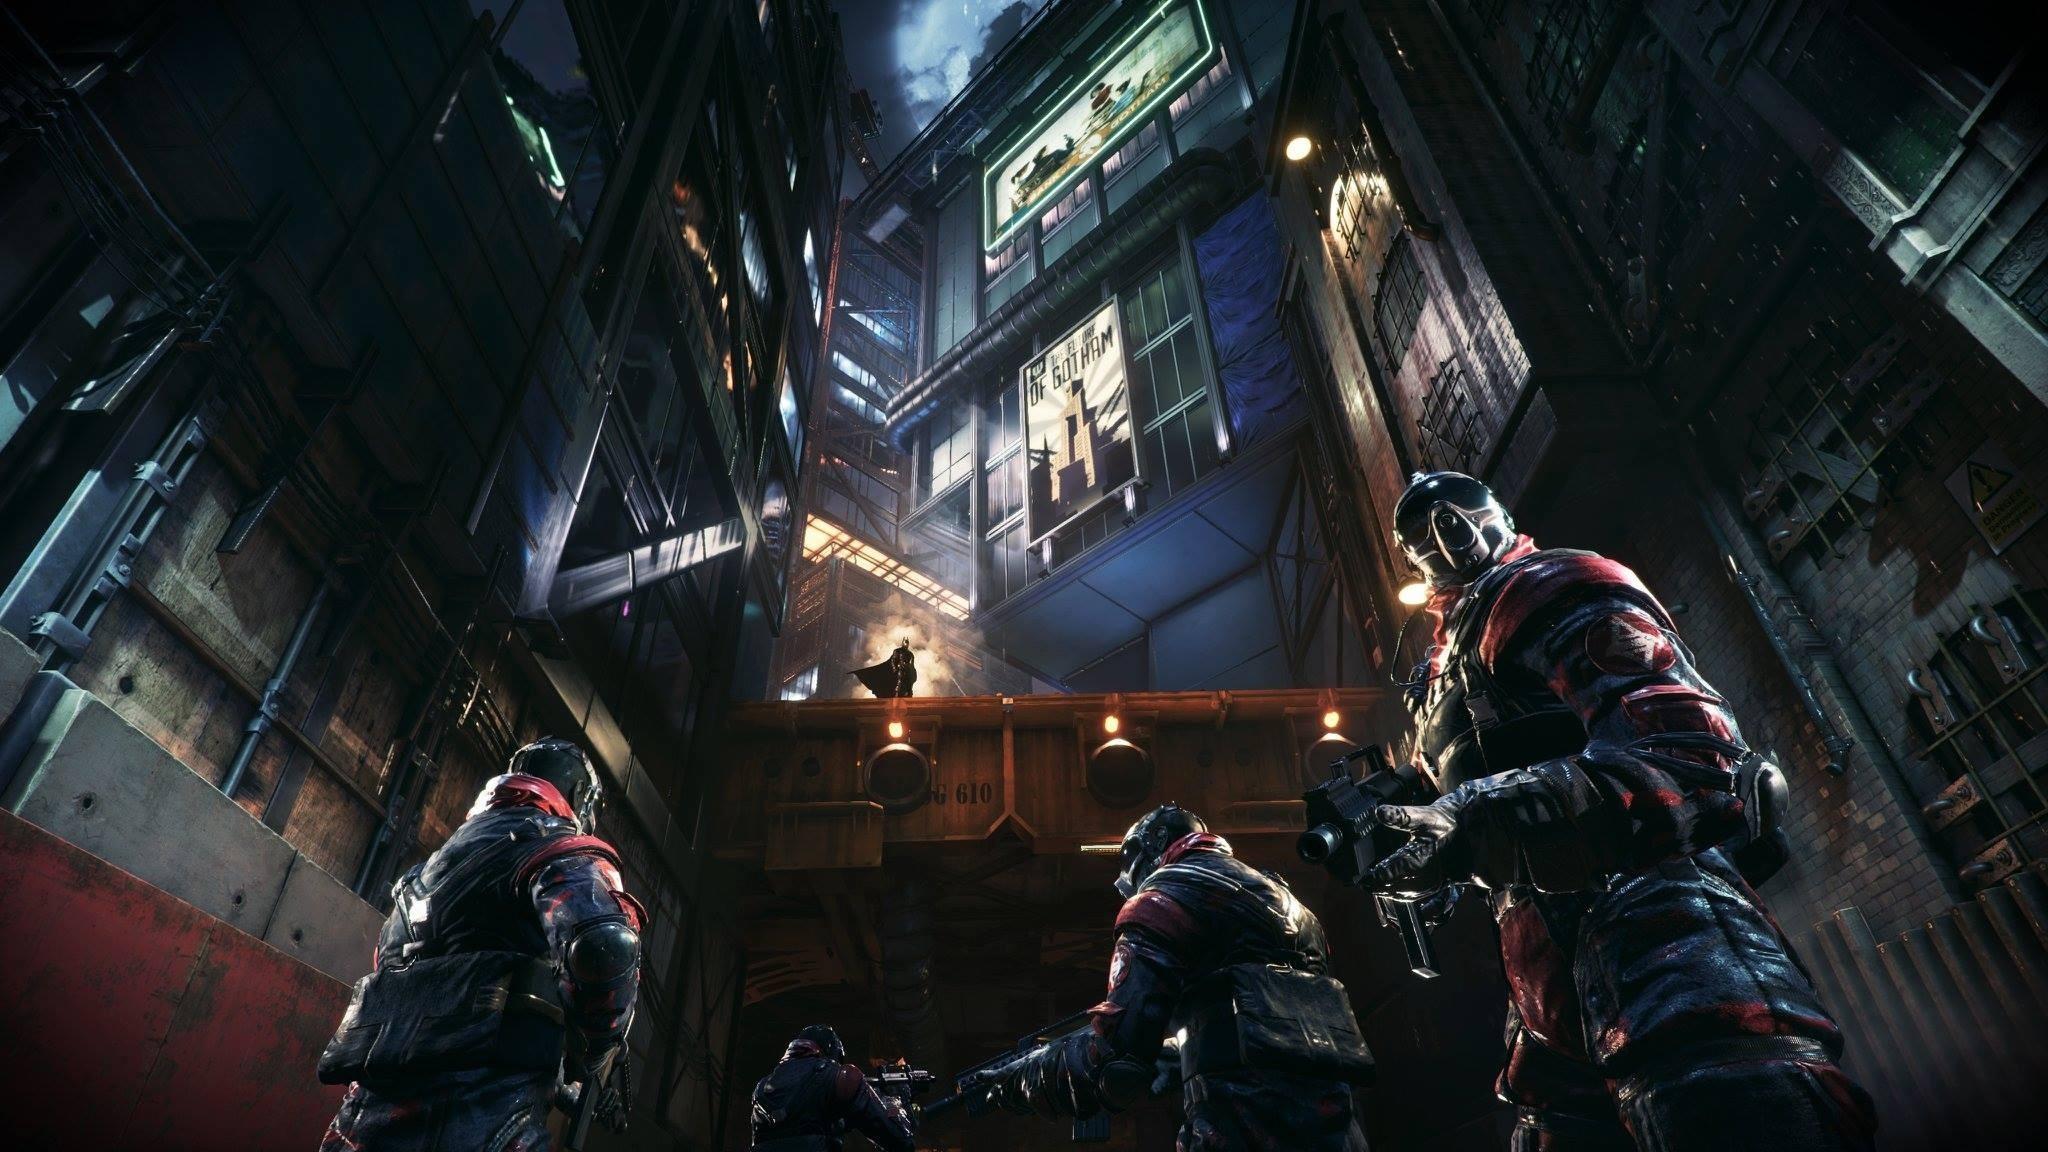 General 2048x1152 Batman Gotham City Batman: Arkham Knight fire street building